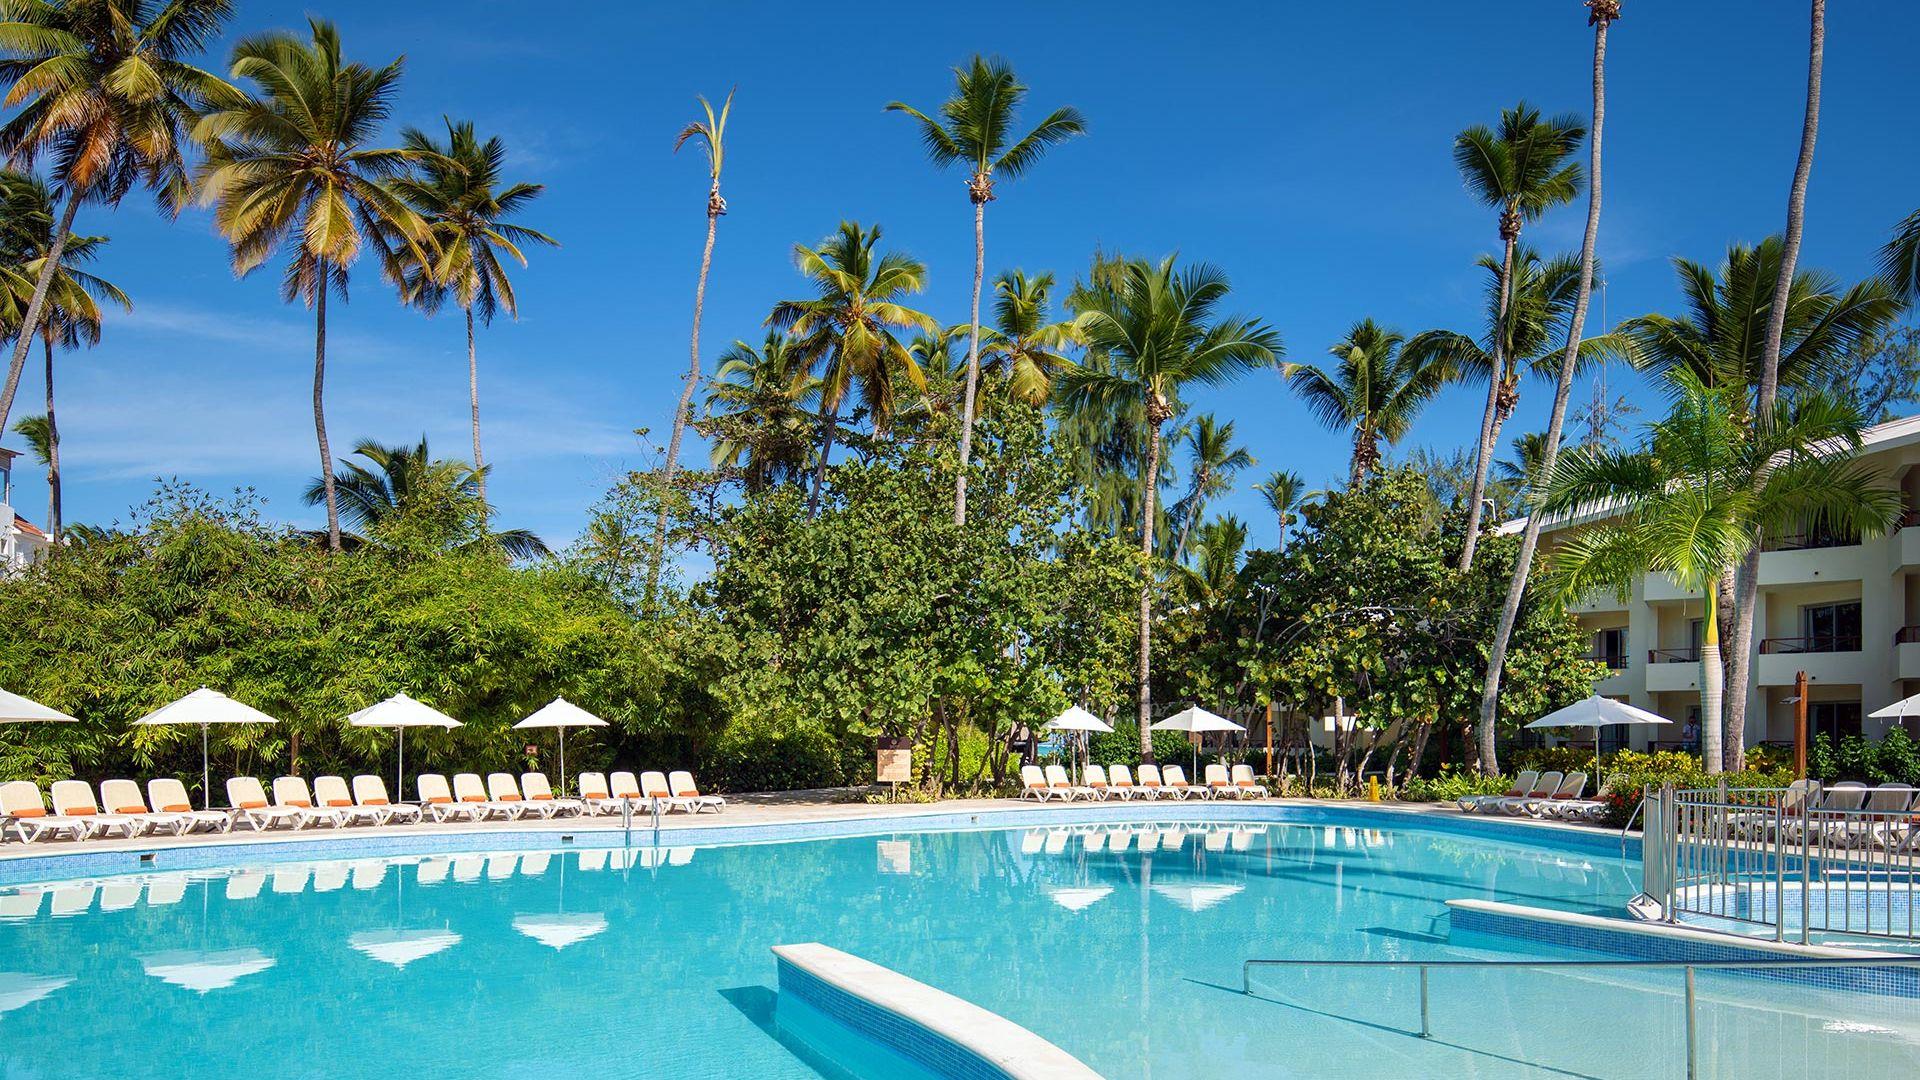 Sejur charter Punta Cana, 9 zile - 26 noiembrie 2021